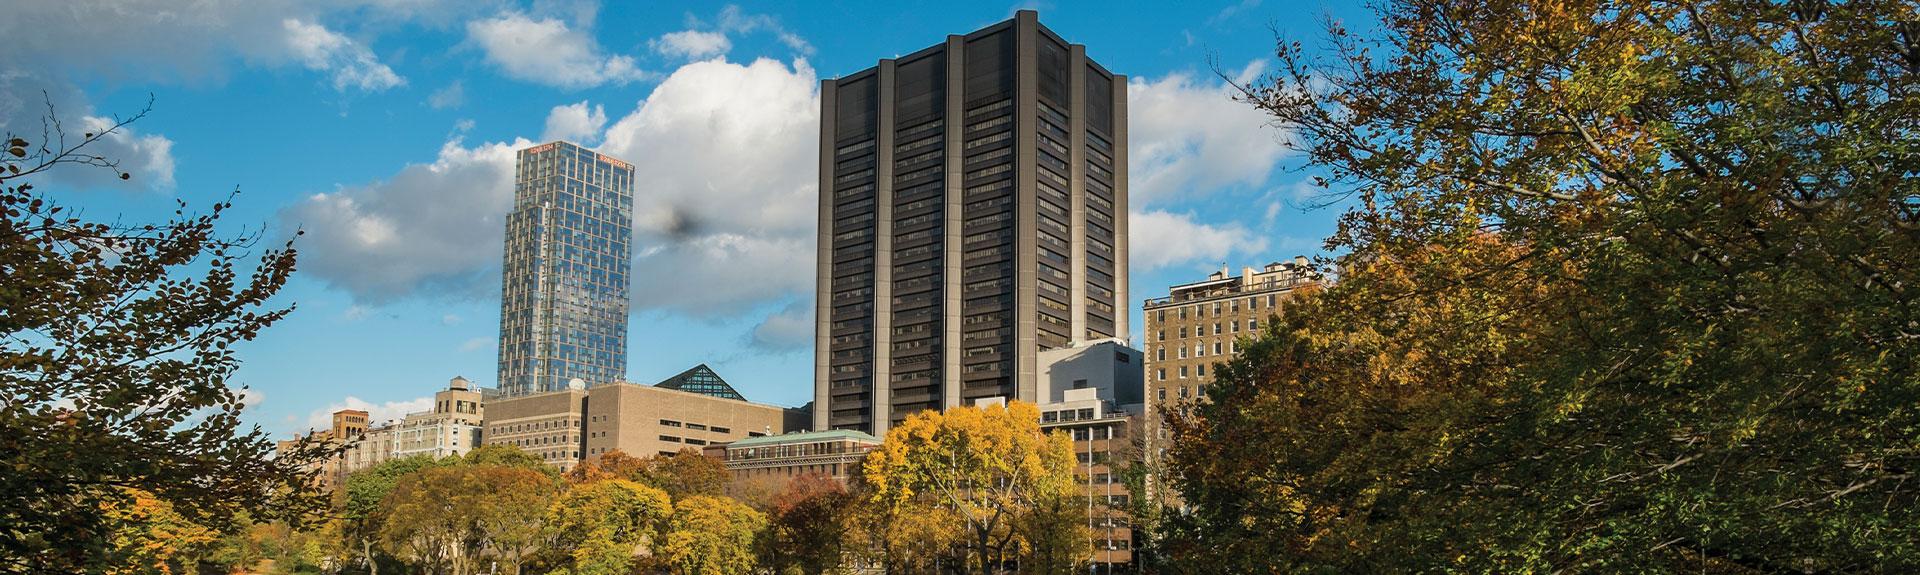 The Mount Sinai Hospital New York City Mount Sinai New York